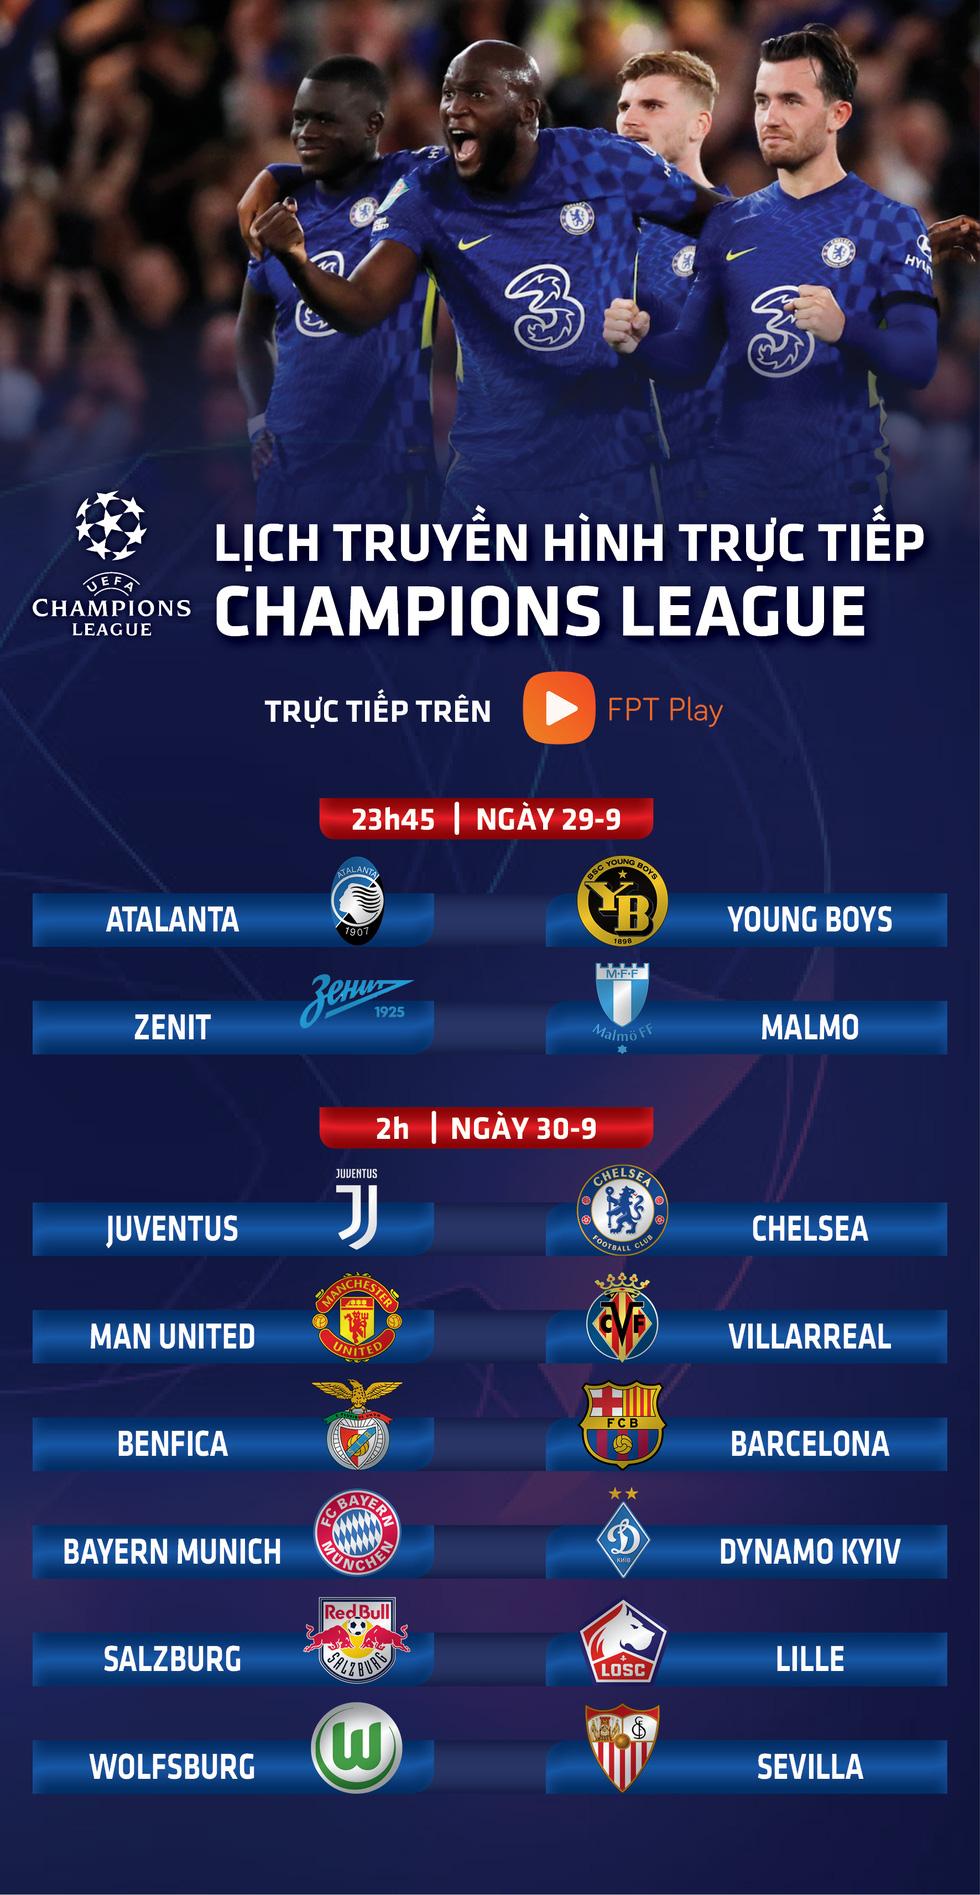 Lịch trực tiếp Champions League 30-9: Nóng bỏng 2 trận Juventus - Chelsea, Man United - Villarreal - Ảnh 1.